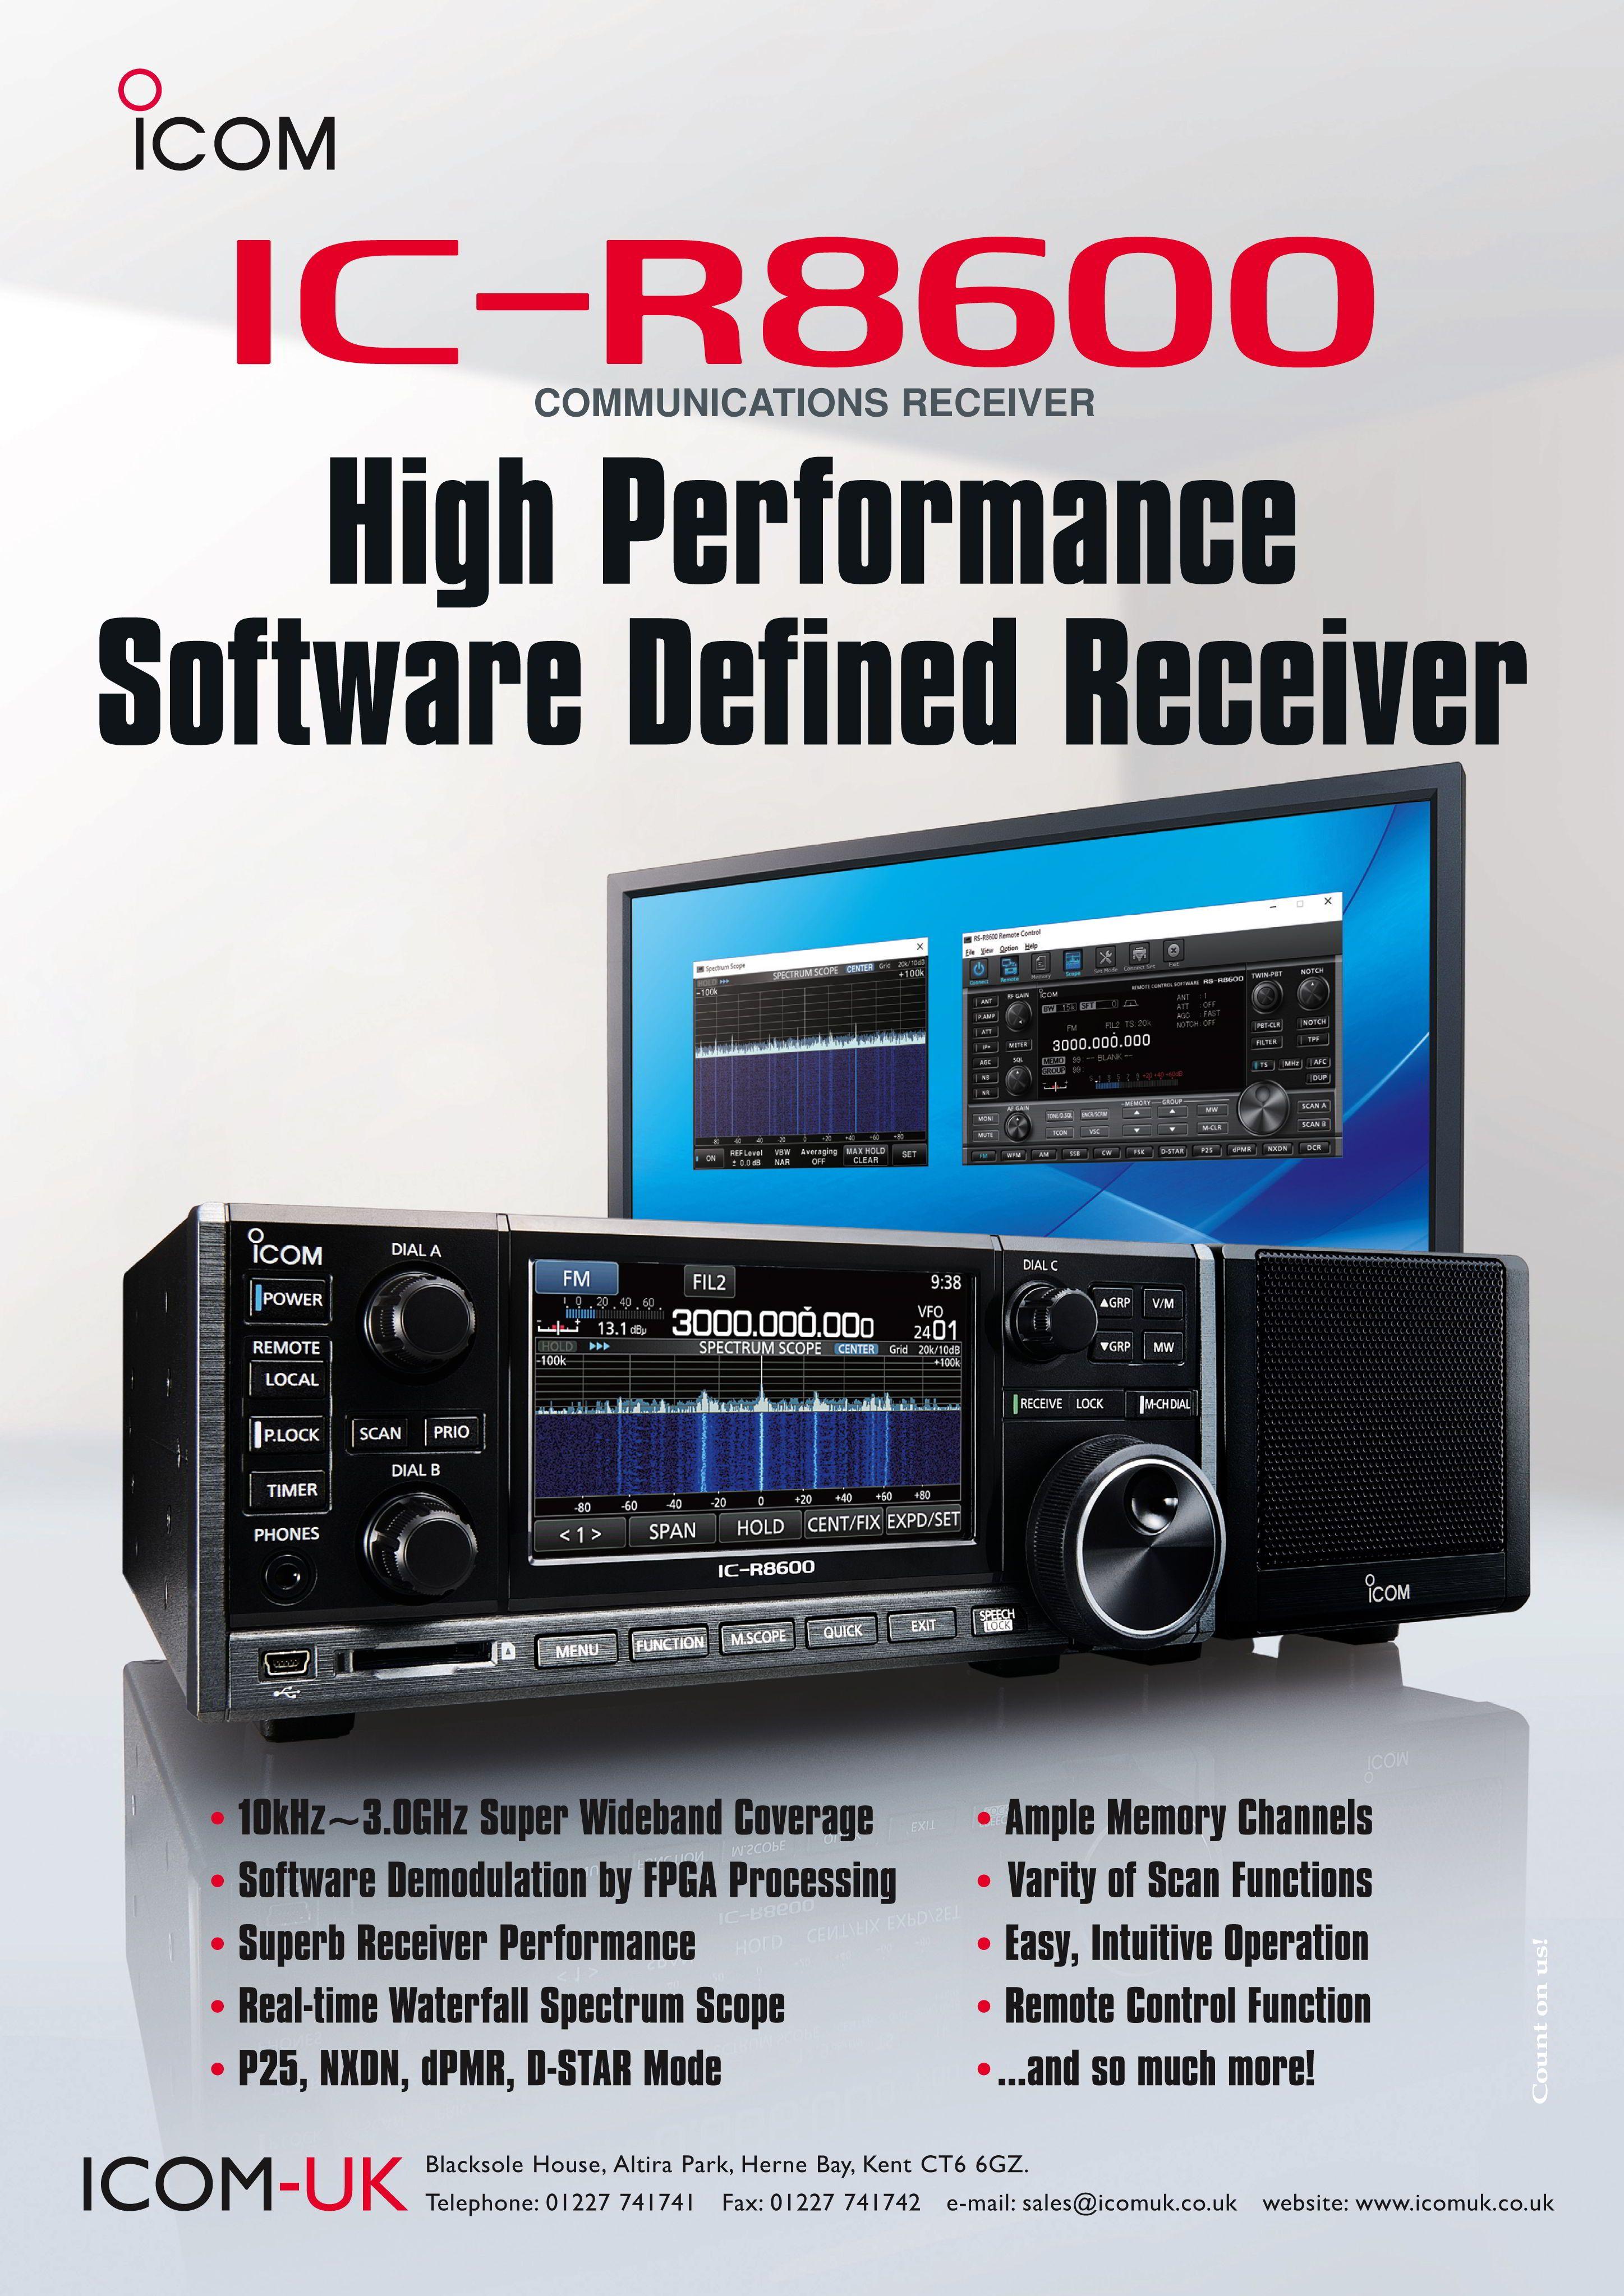 Pin by Icom on Receivers/scanners | Internet radio, Ham radio